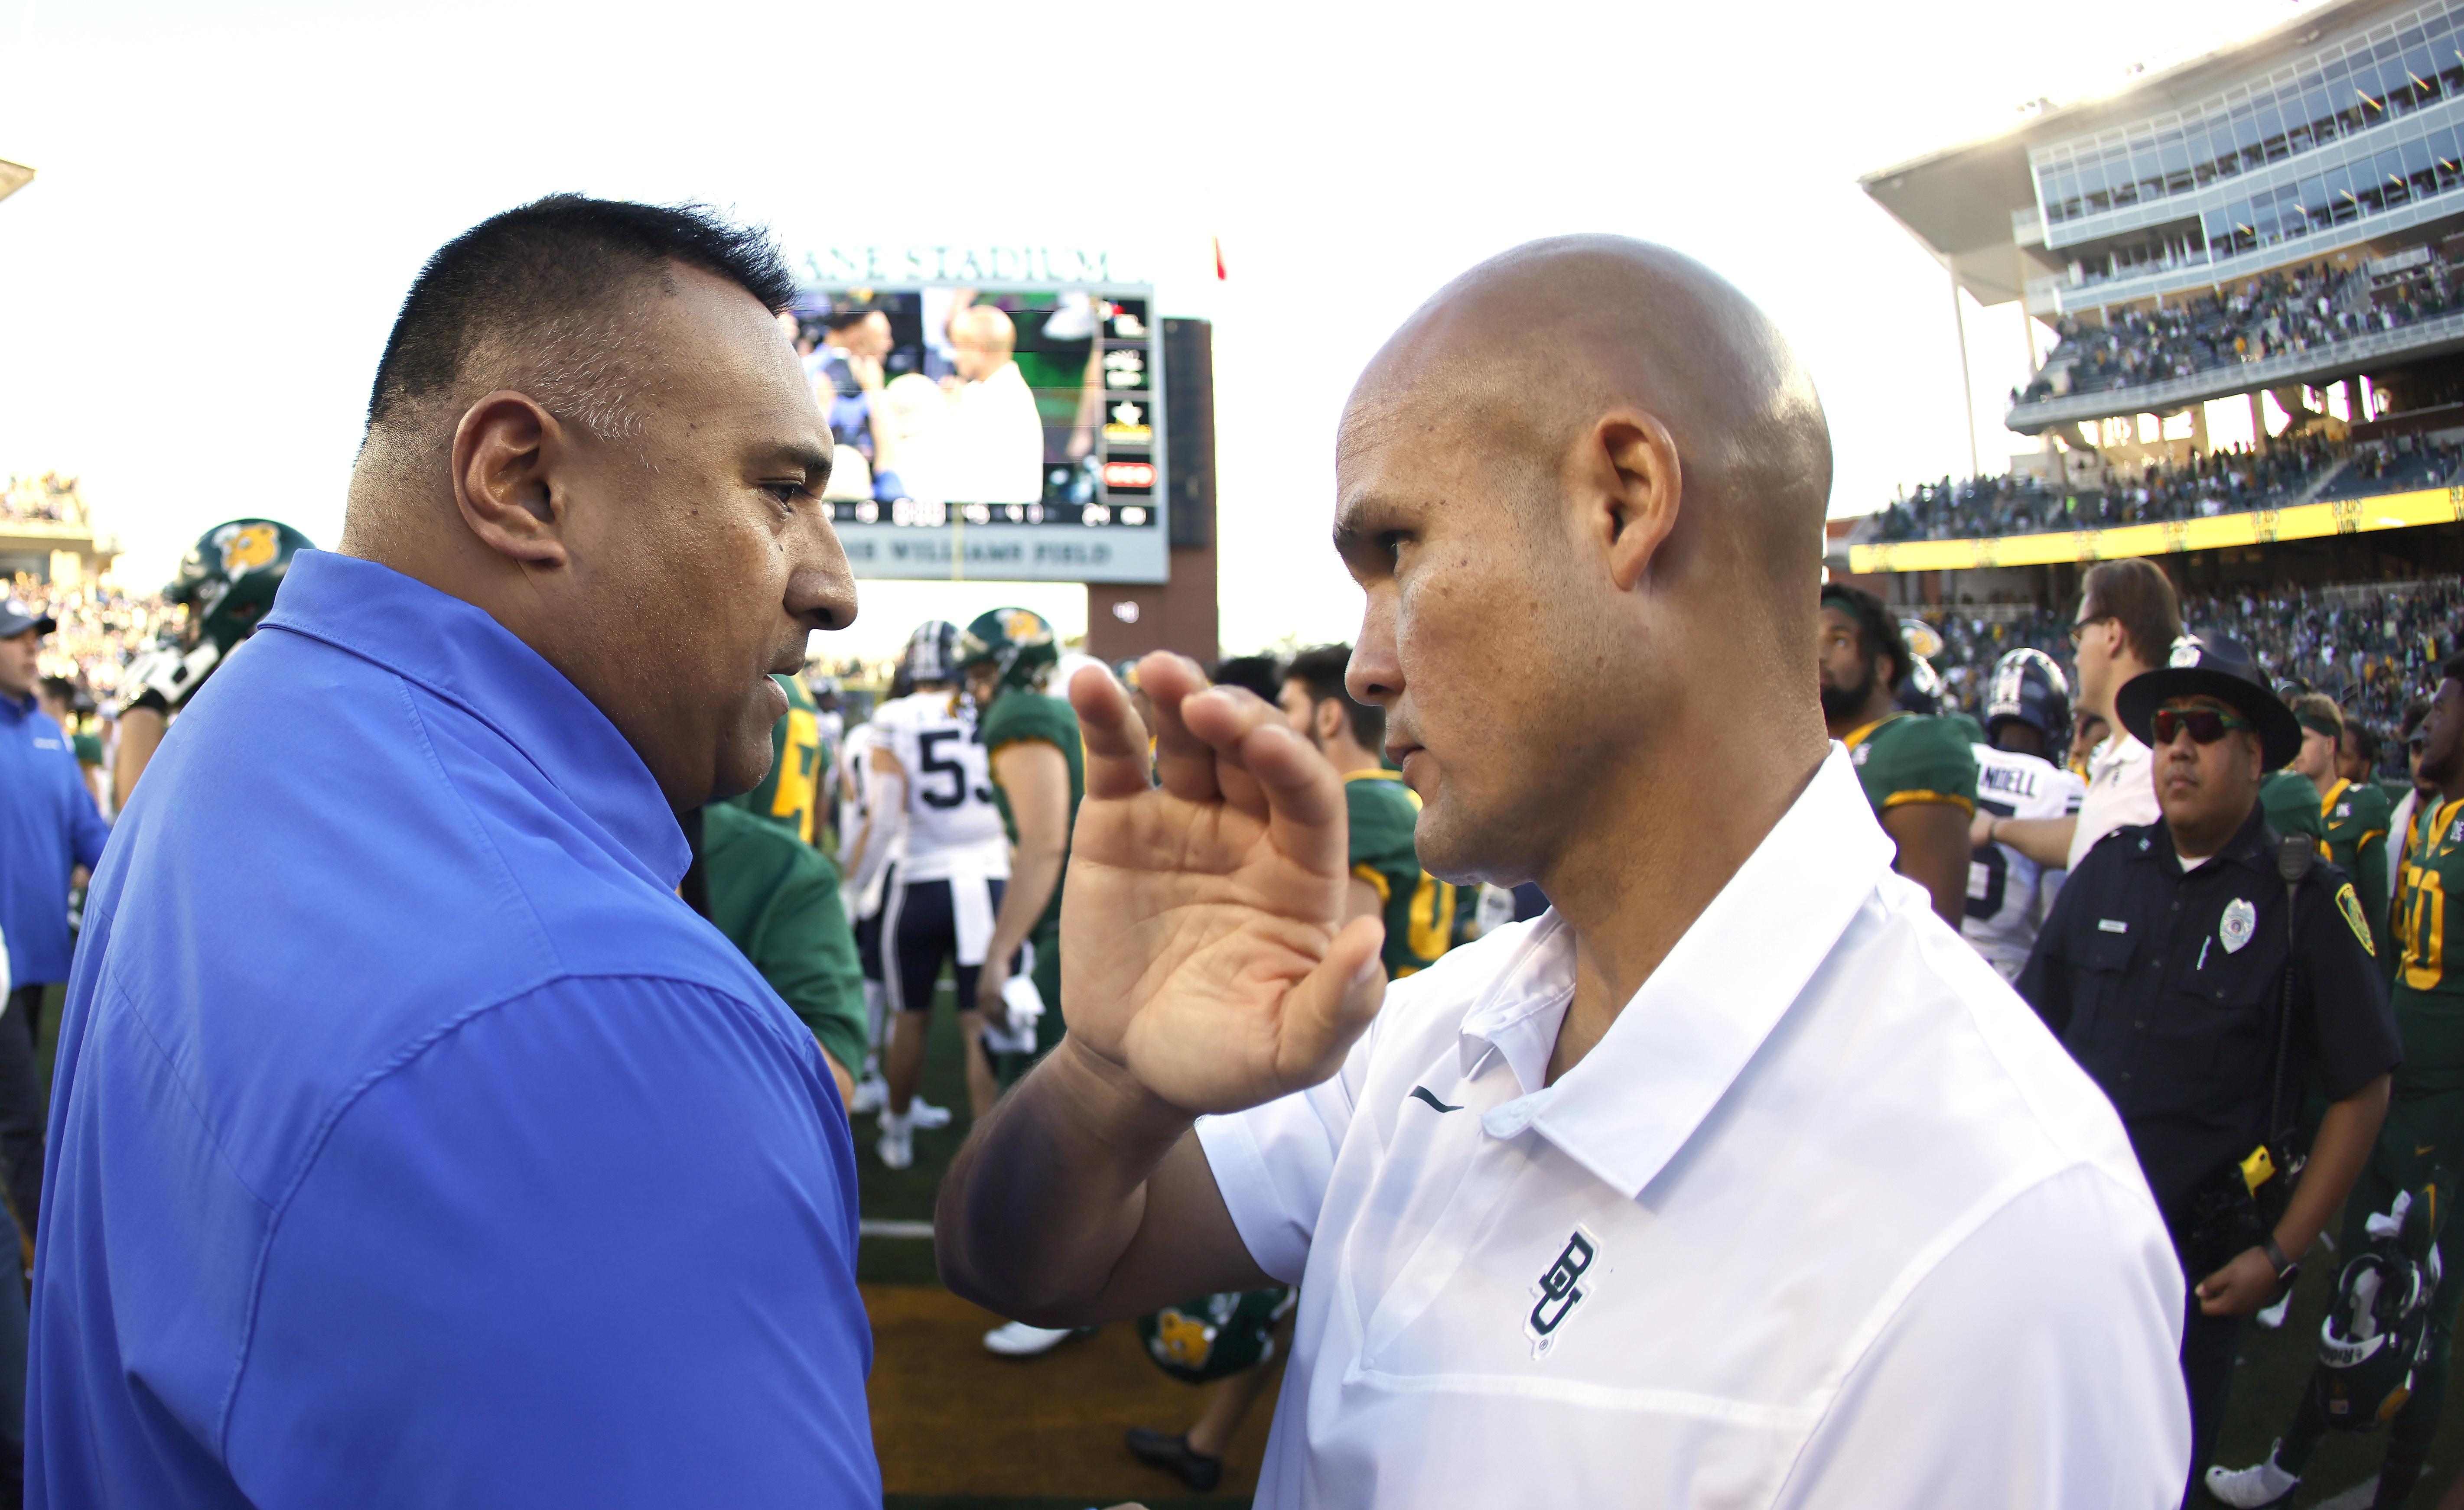 BYU head coach Kalani Sitake shakes hands with Baylor head coach Dave Aranda